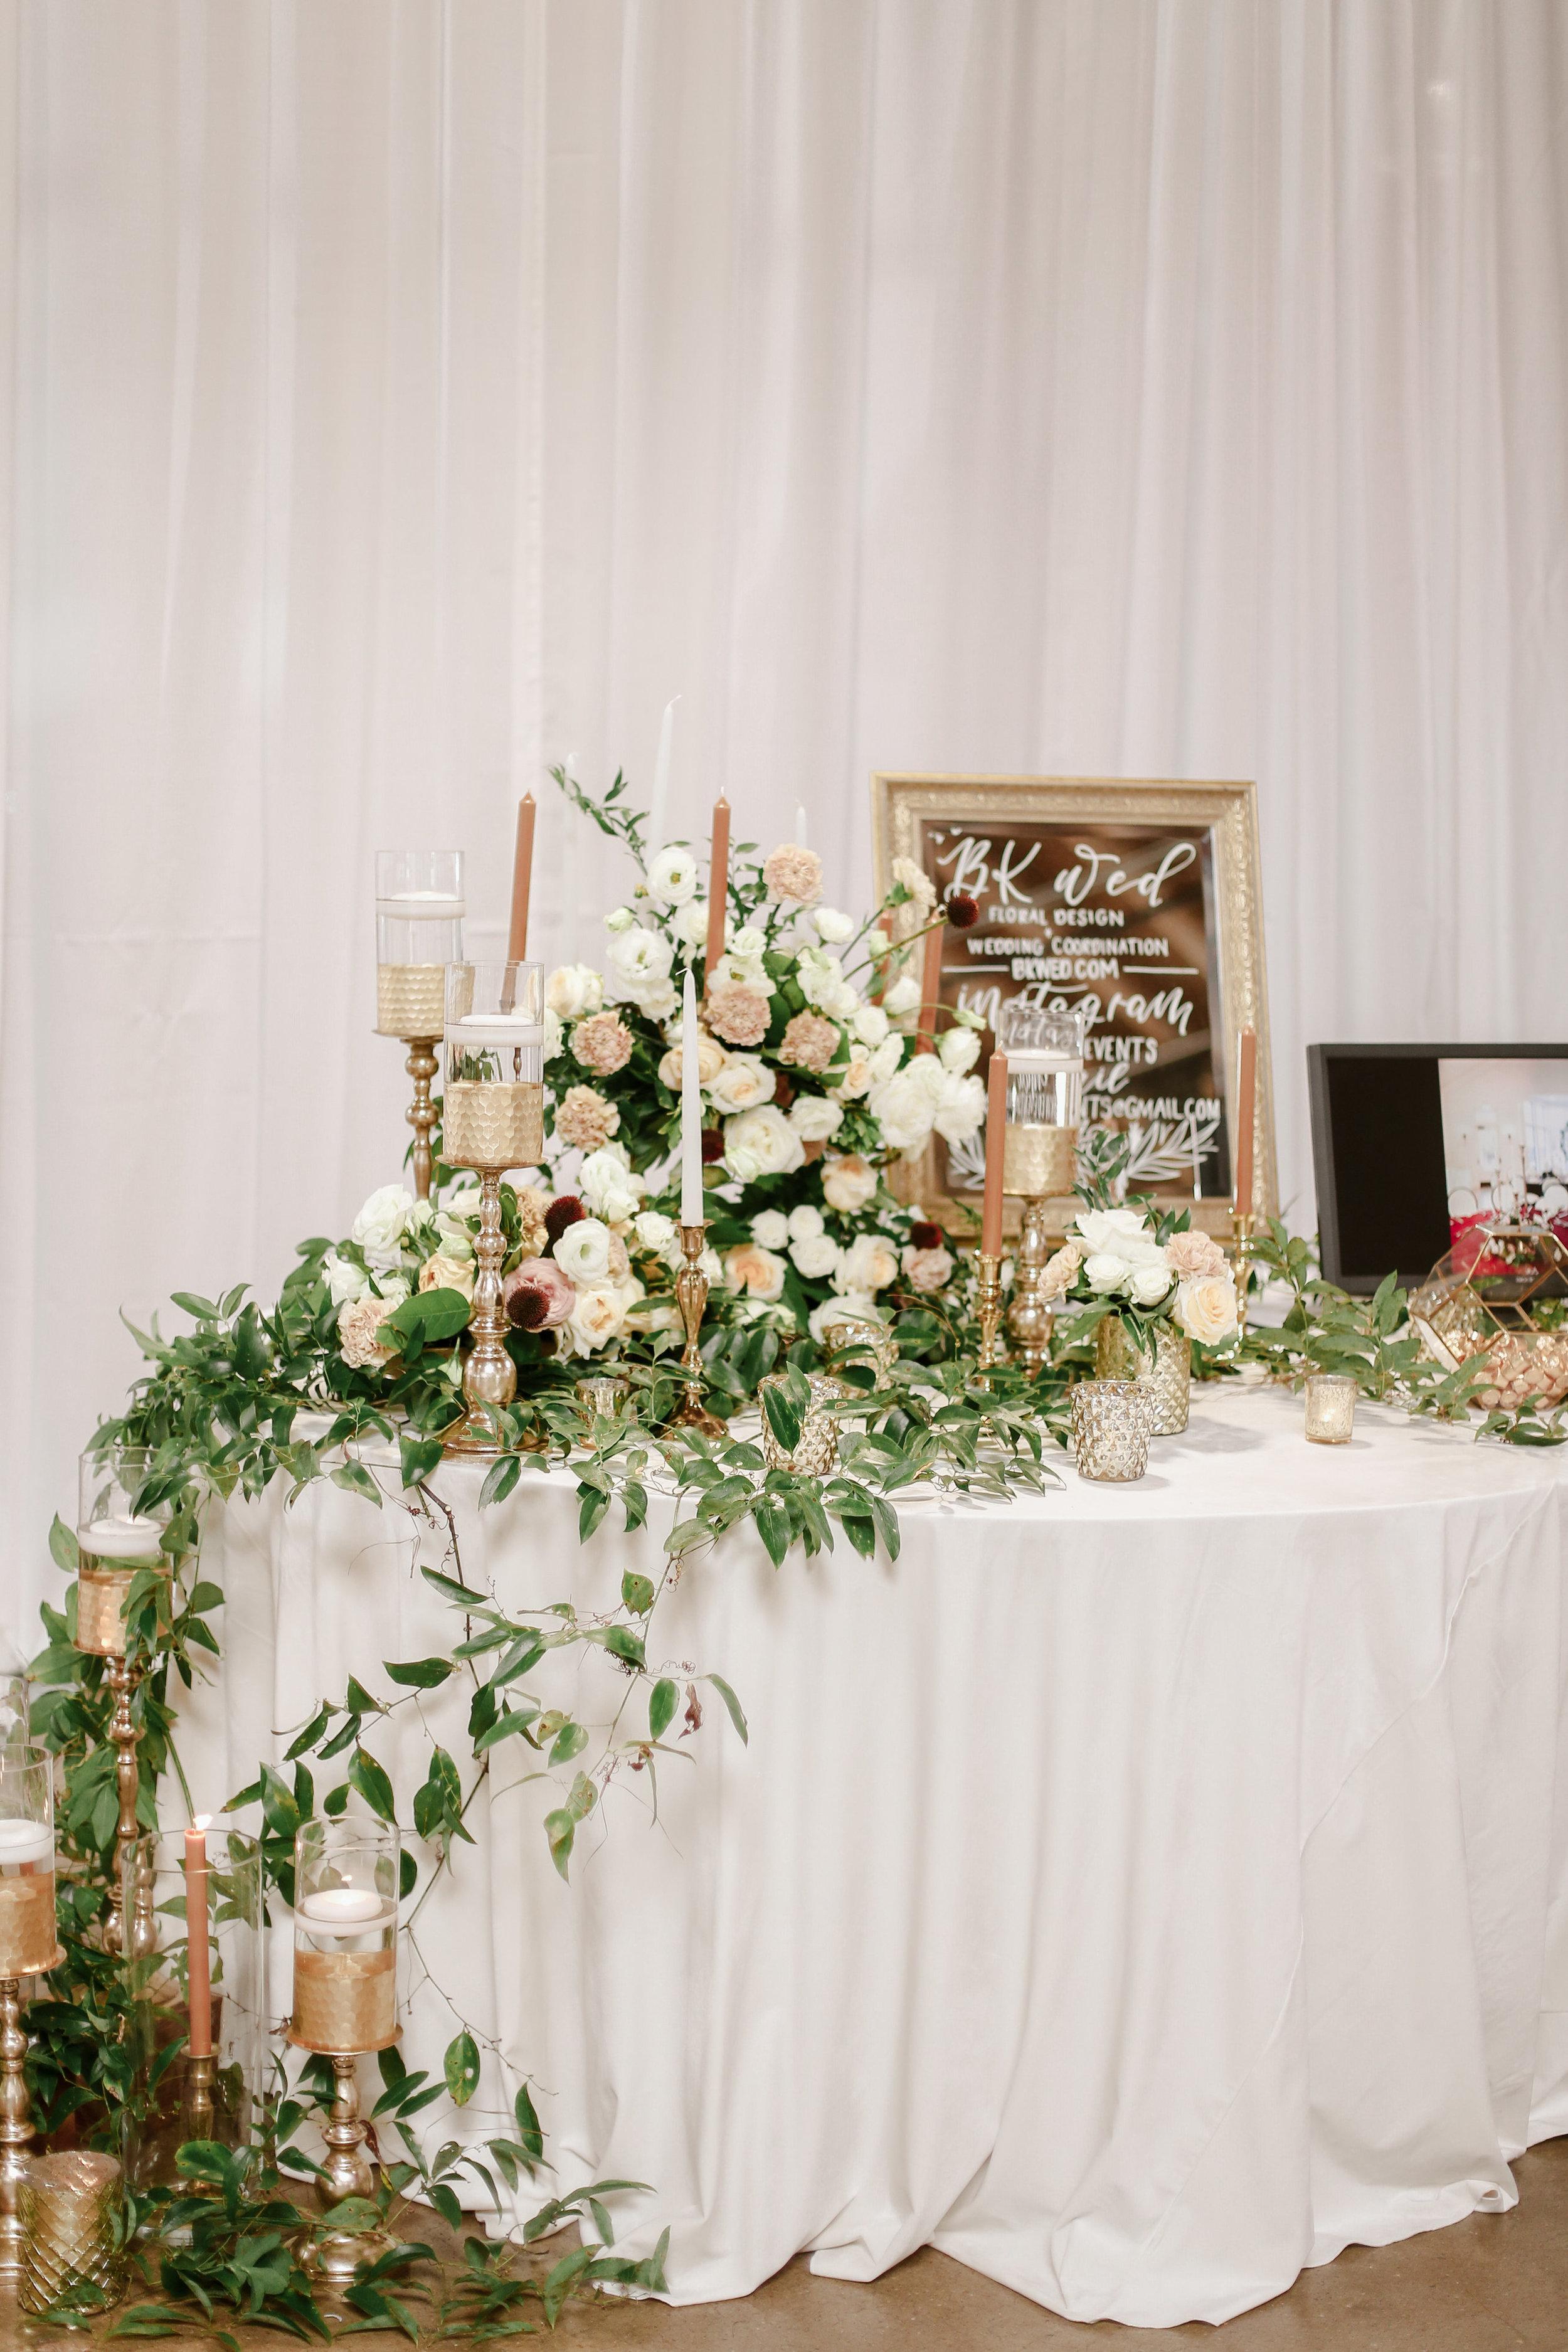 Engaged Event-Engaged Event-0043.jpg